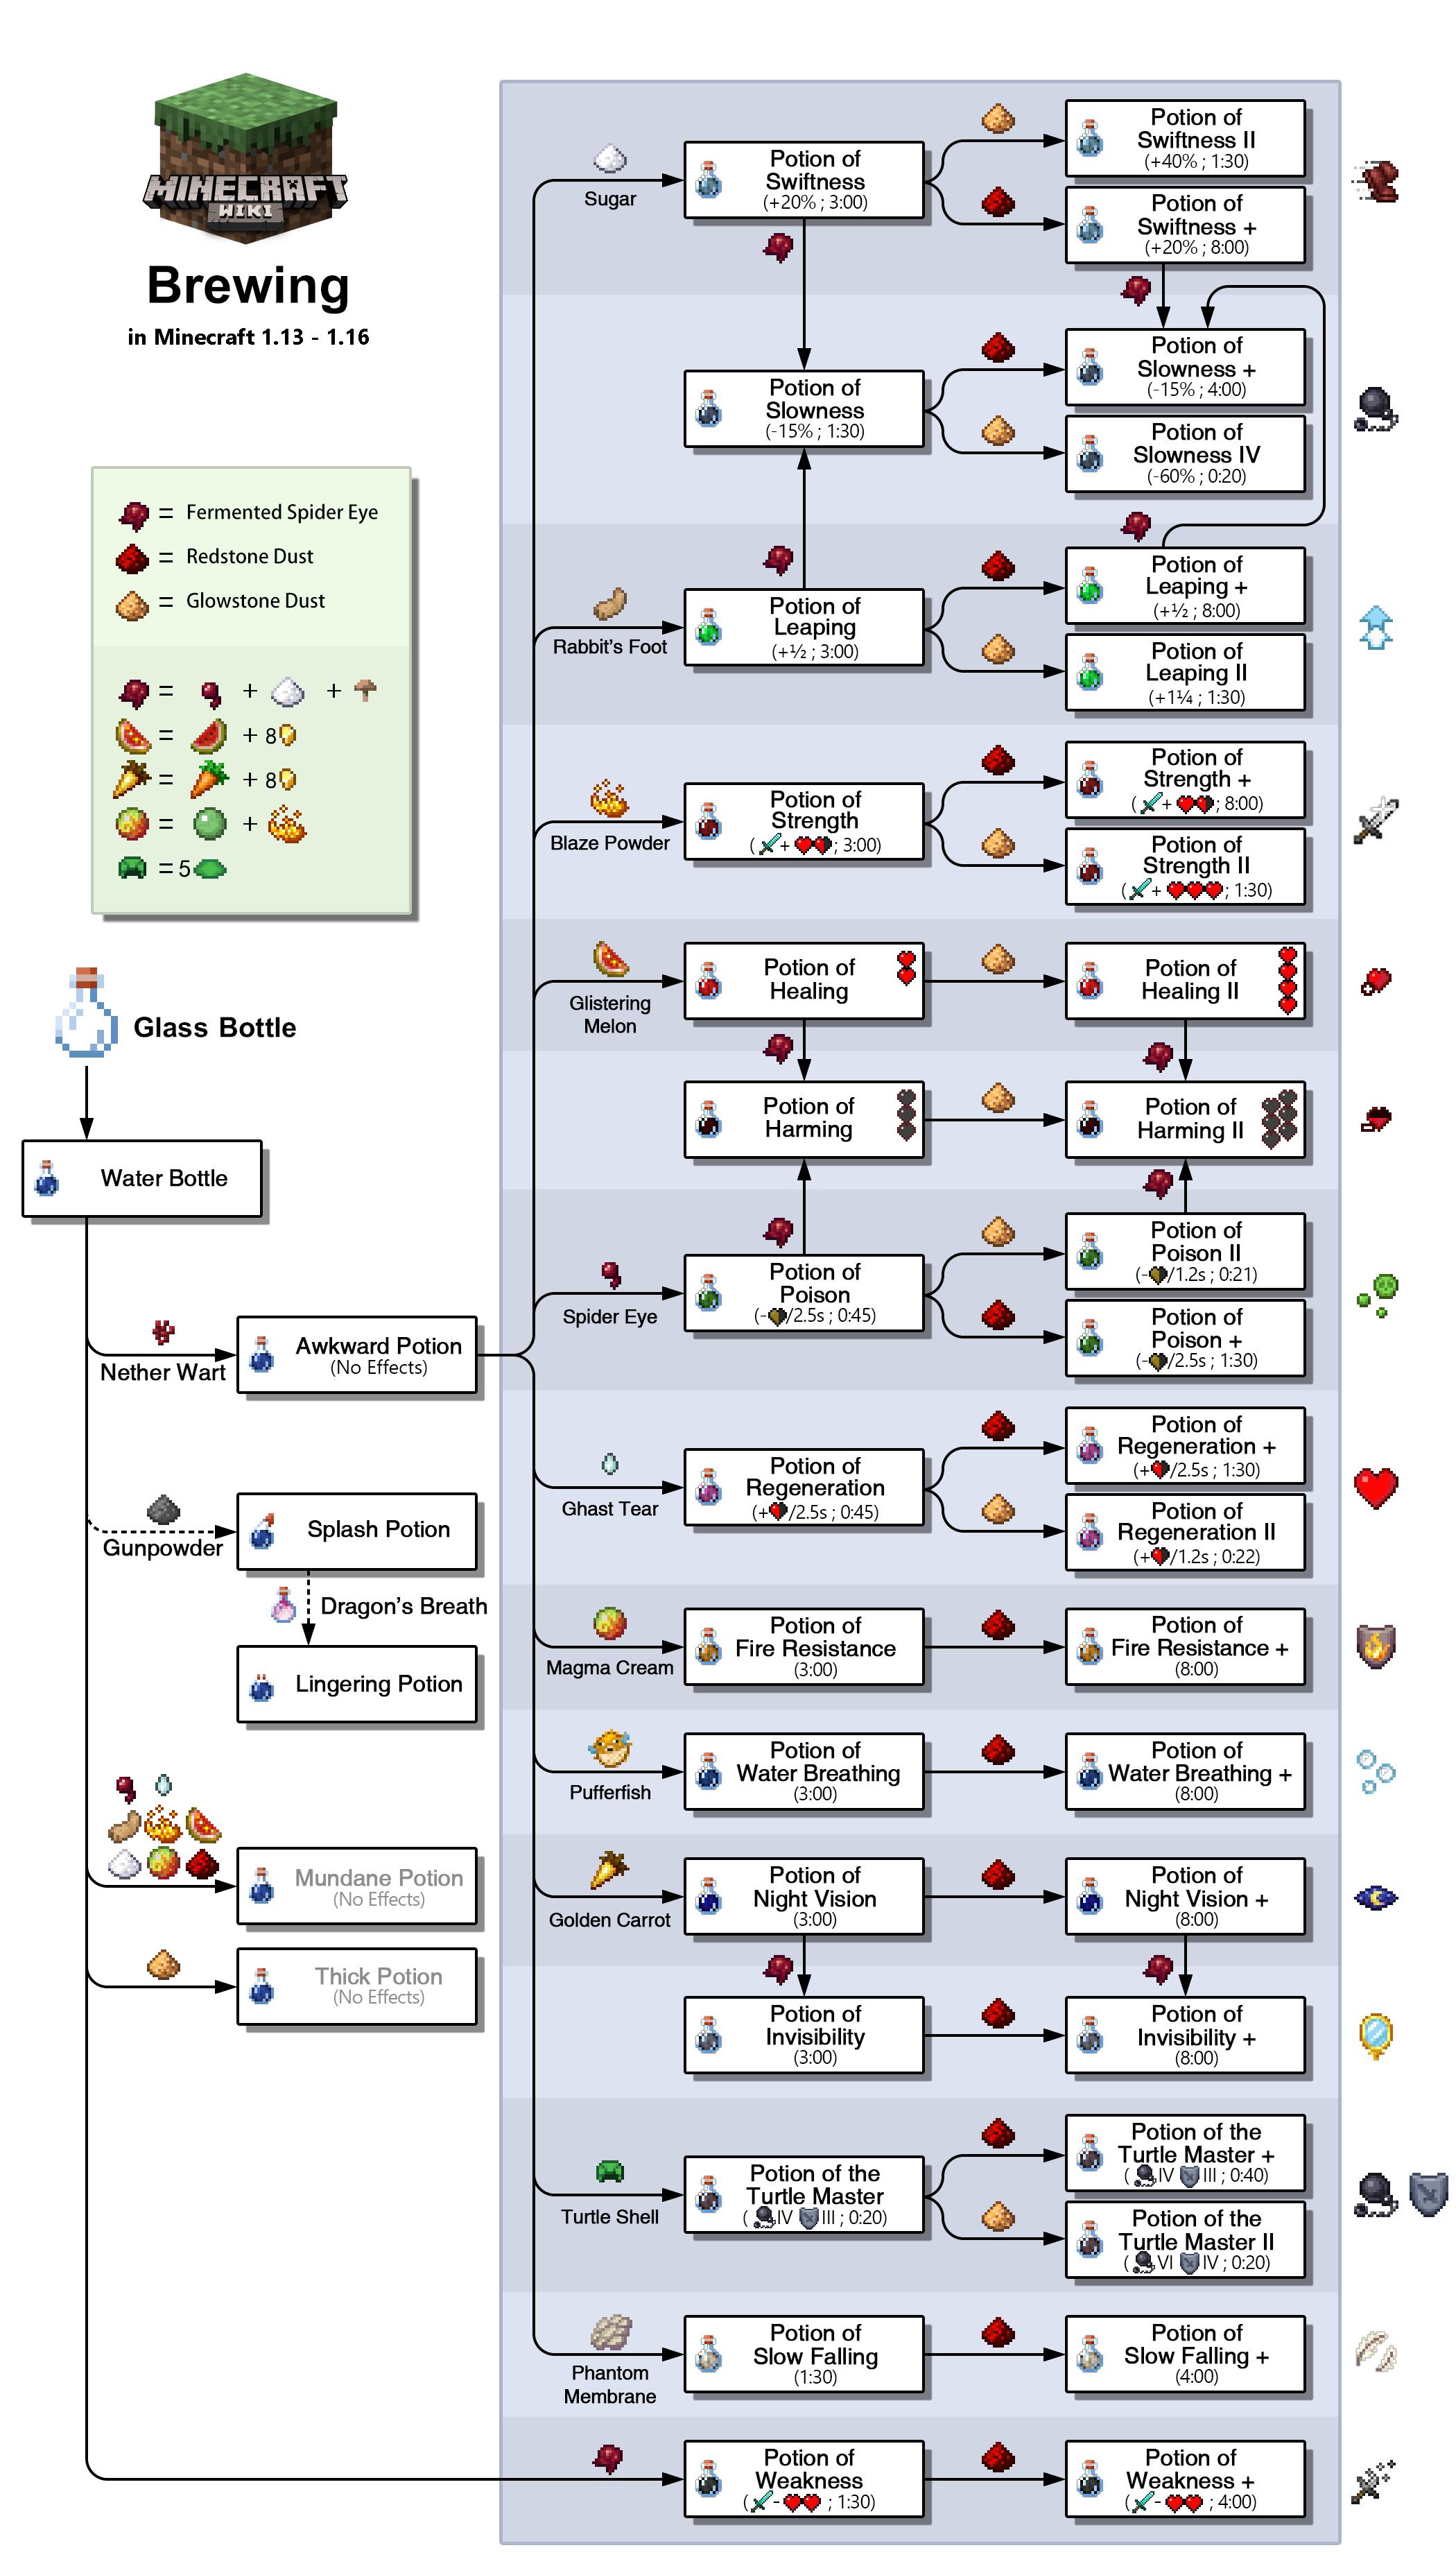 Brewing in Mincraft 1.13 -1.16